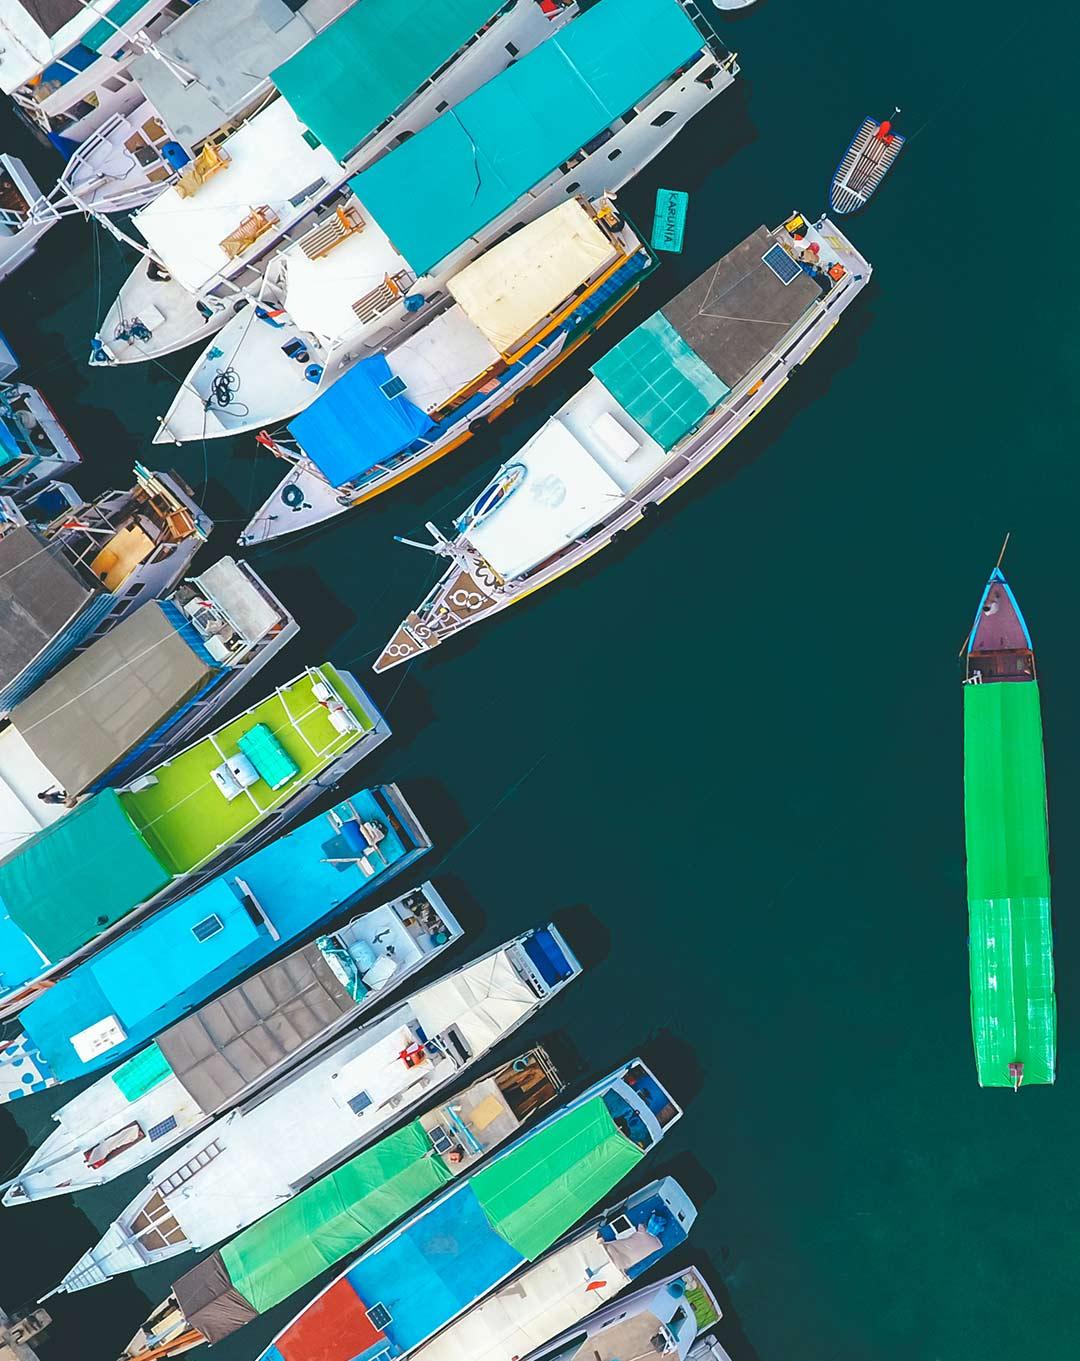 Aerial view of Labuan Bajo Marina